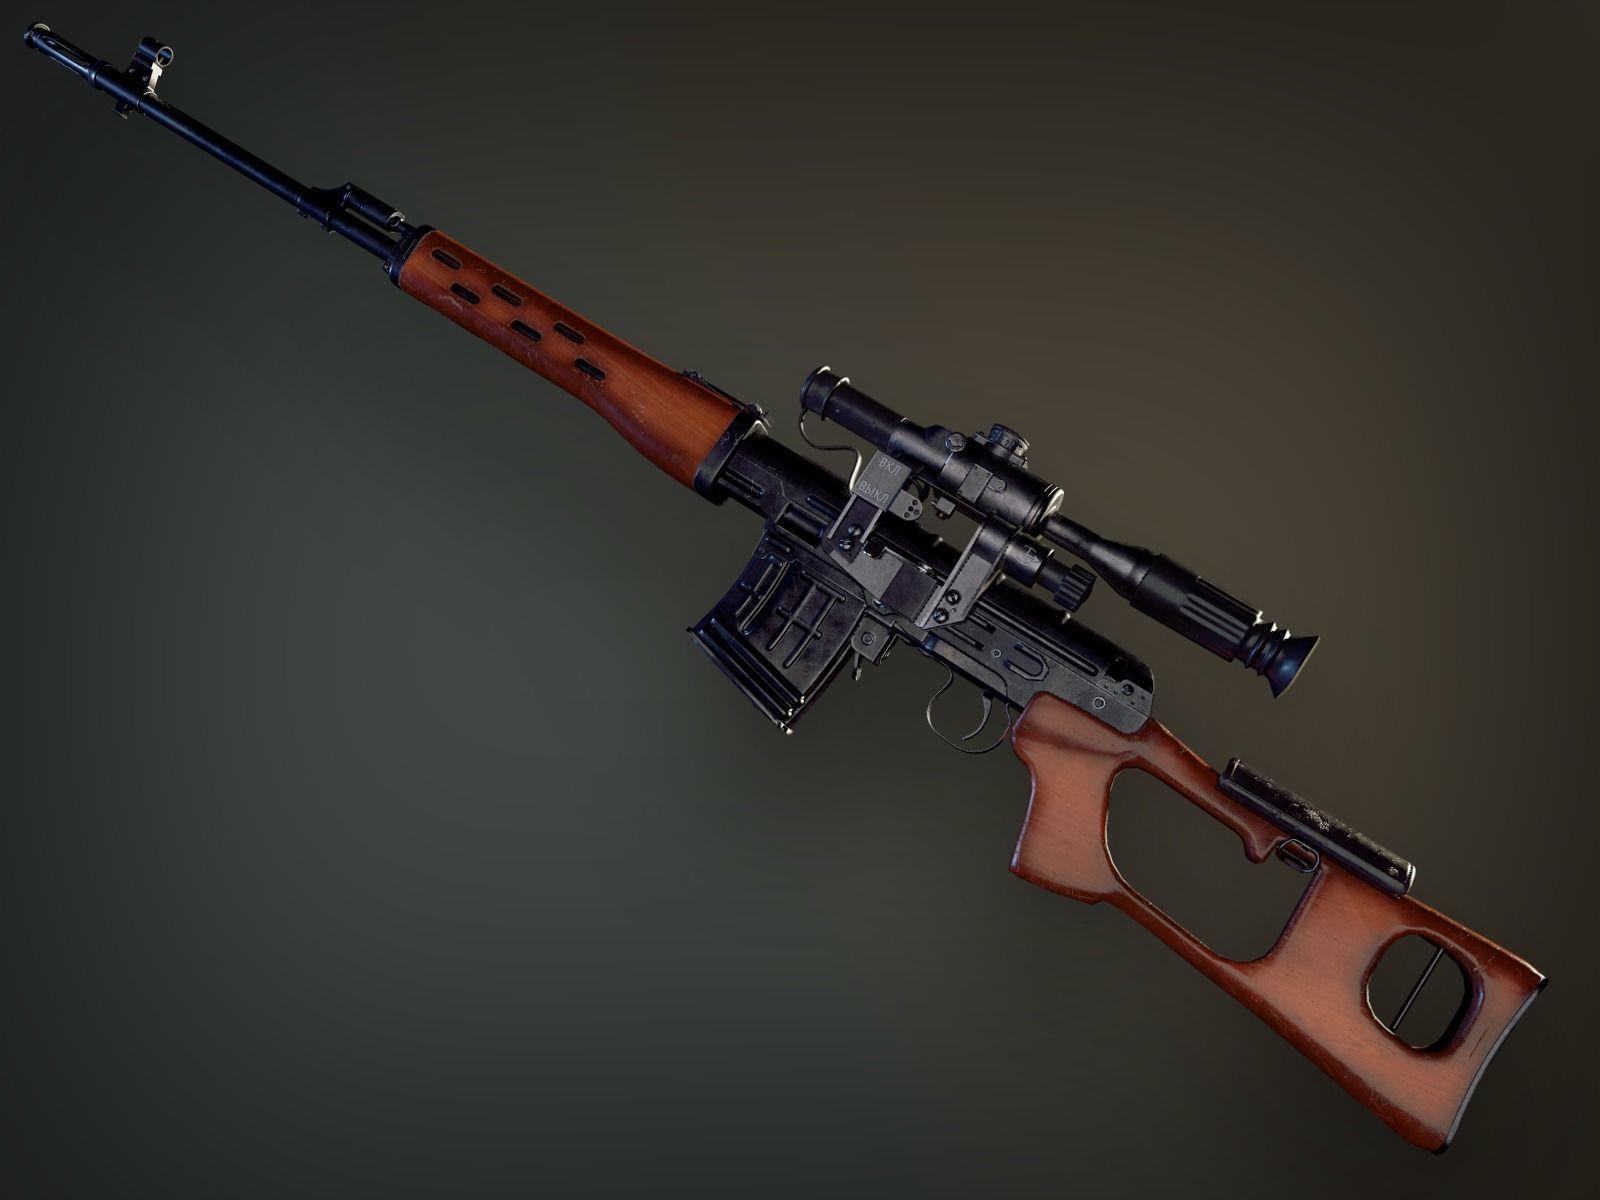 lowpoly-pbr-dragunov-sniper-rifle-svd-3d-model-low-poly-obj-mtl-fbx-dae-unitypackage-prefab.jpg